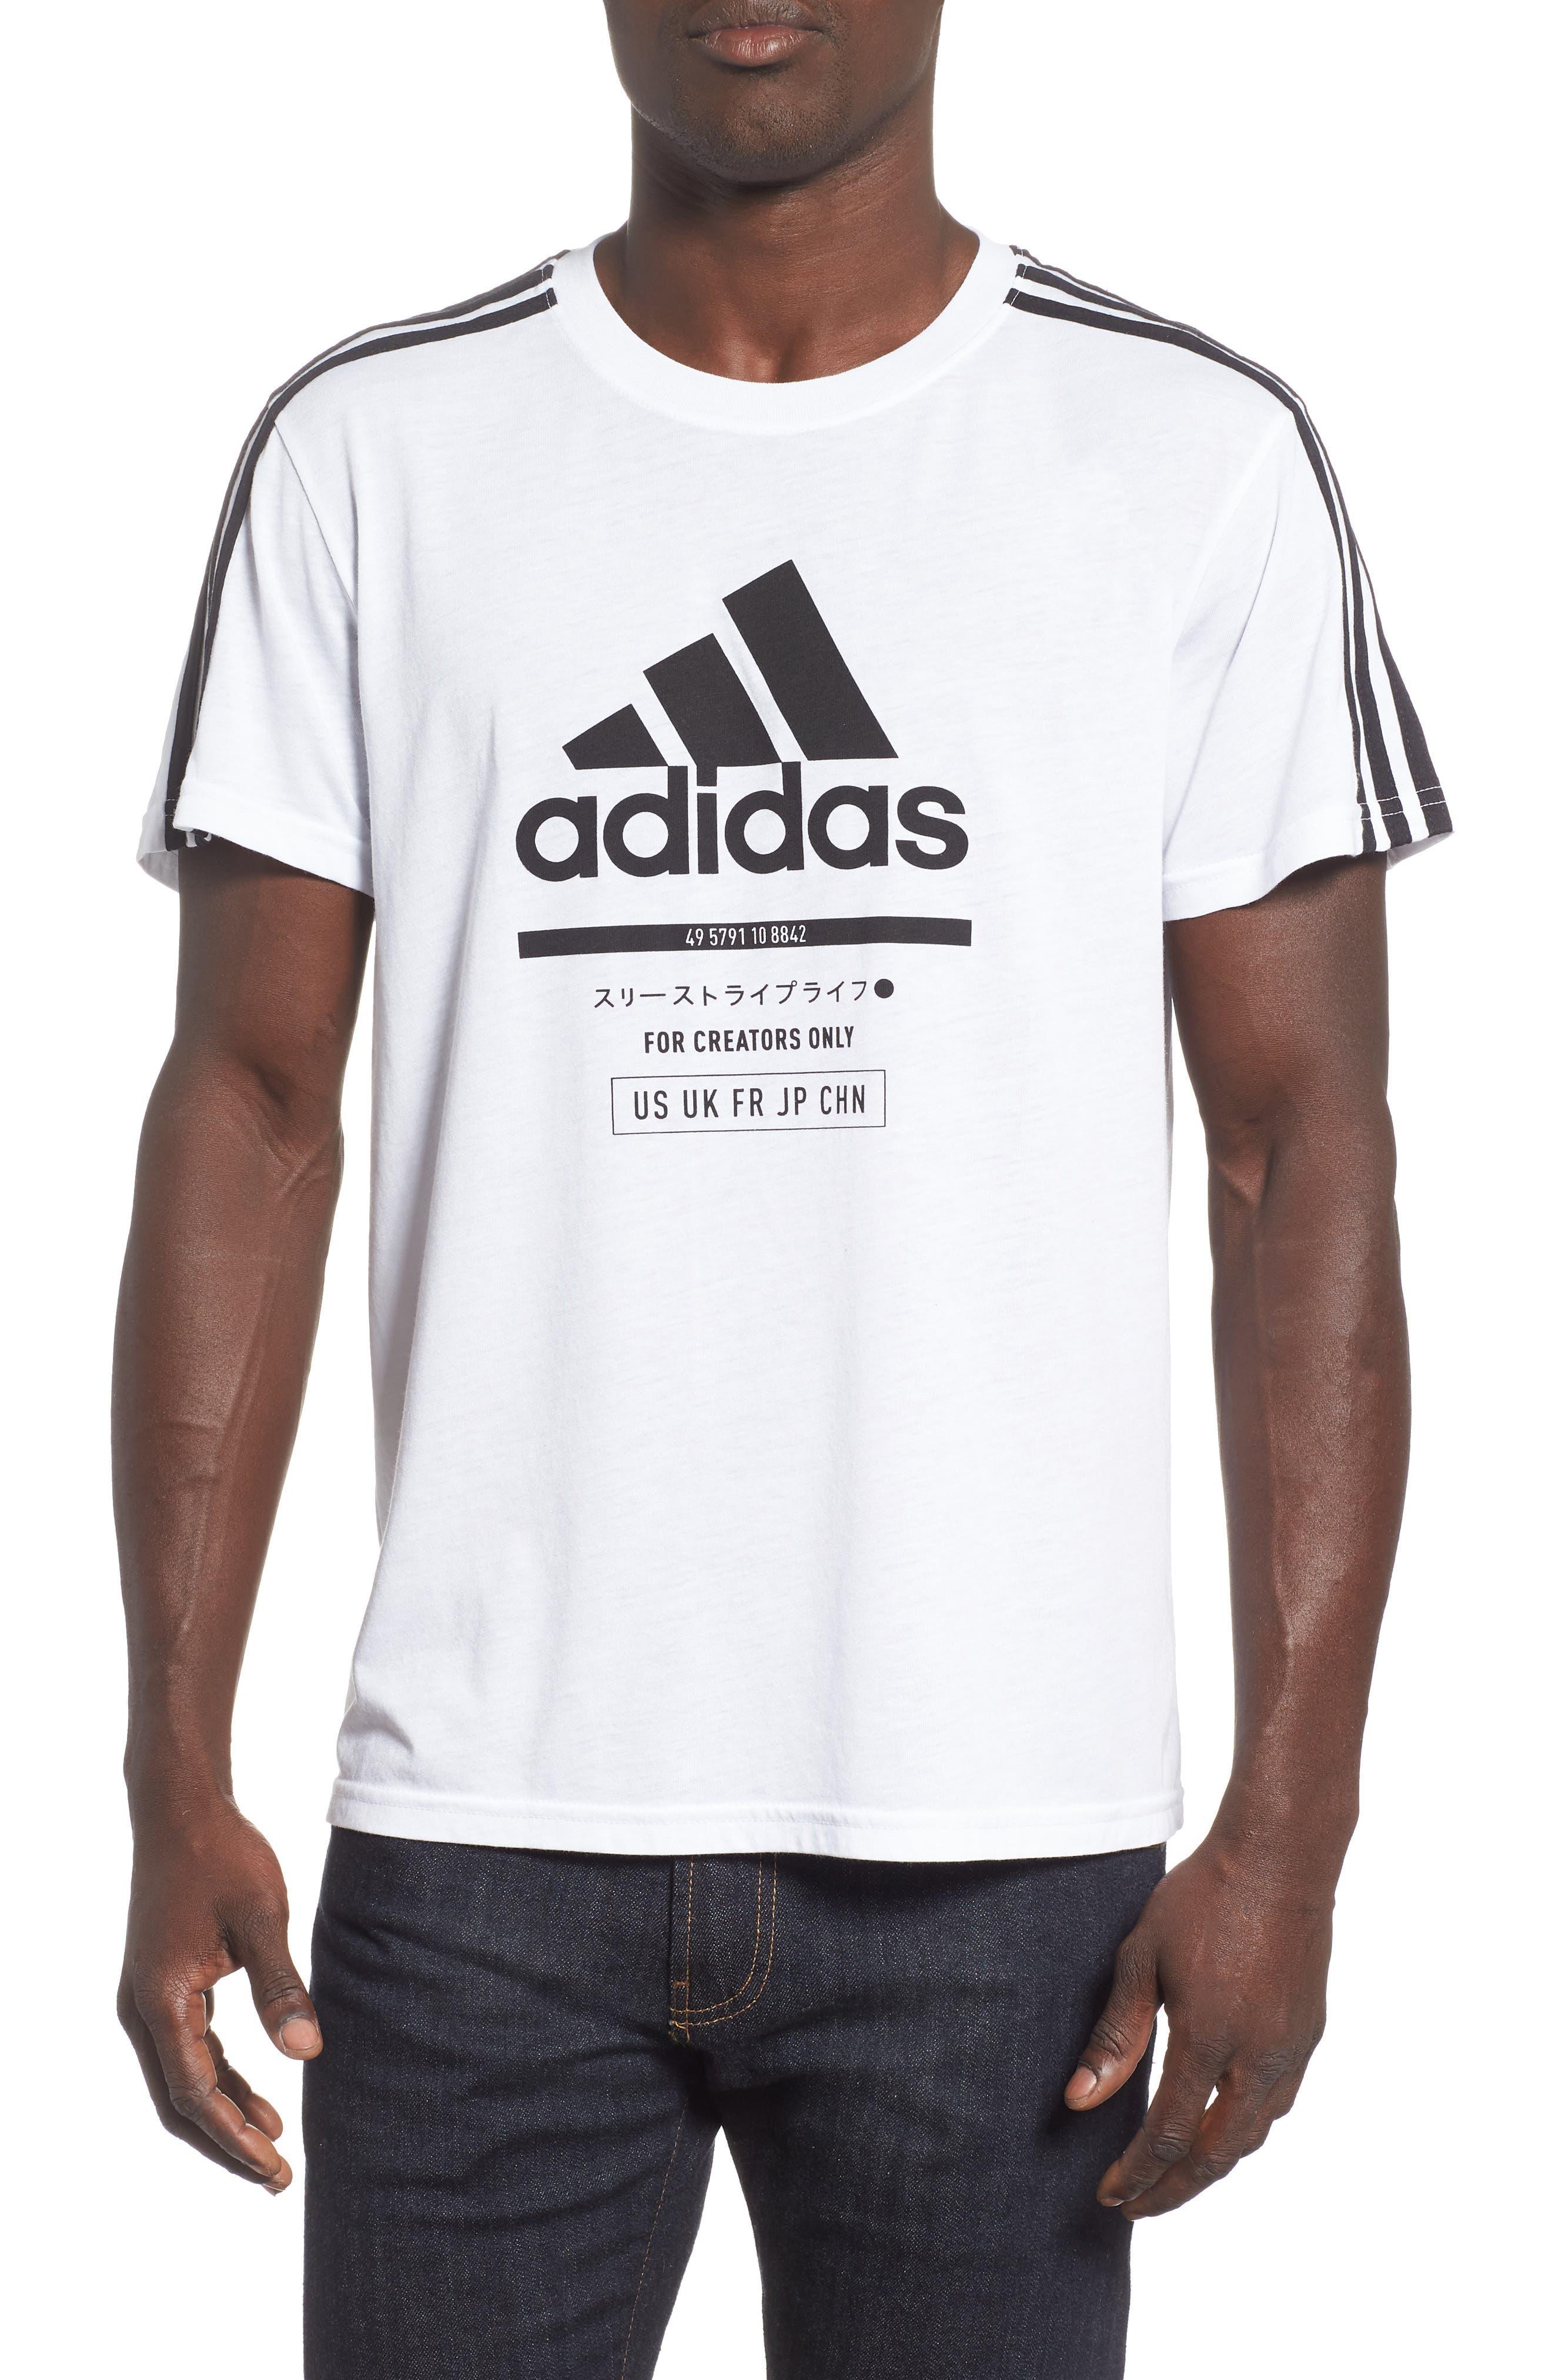 Adidas Classic International Regular Fit T-Shirt, White